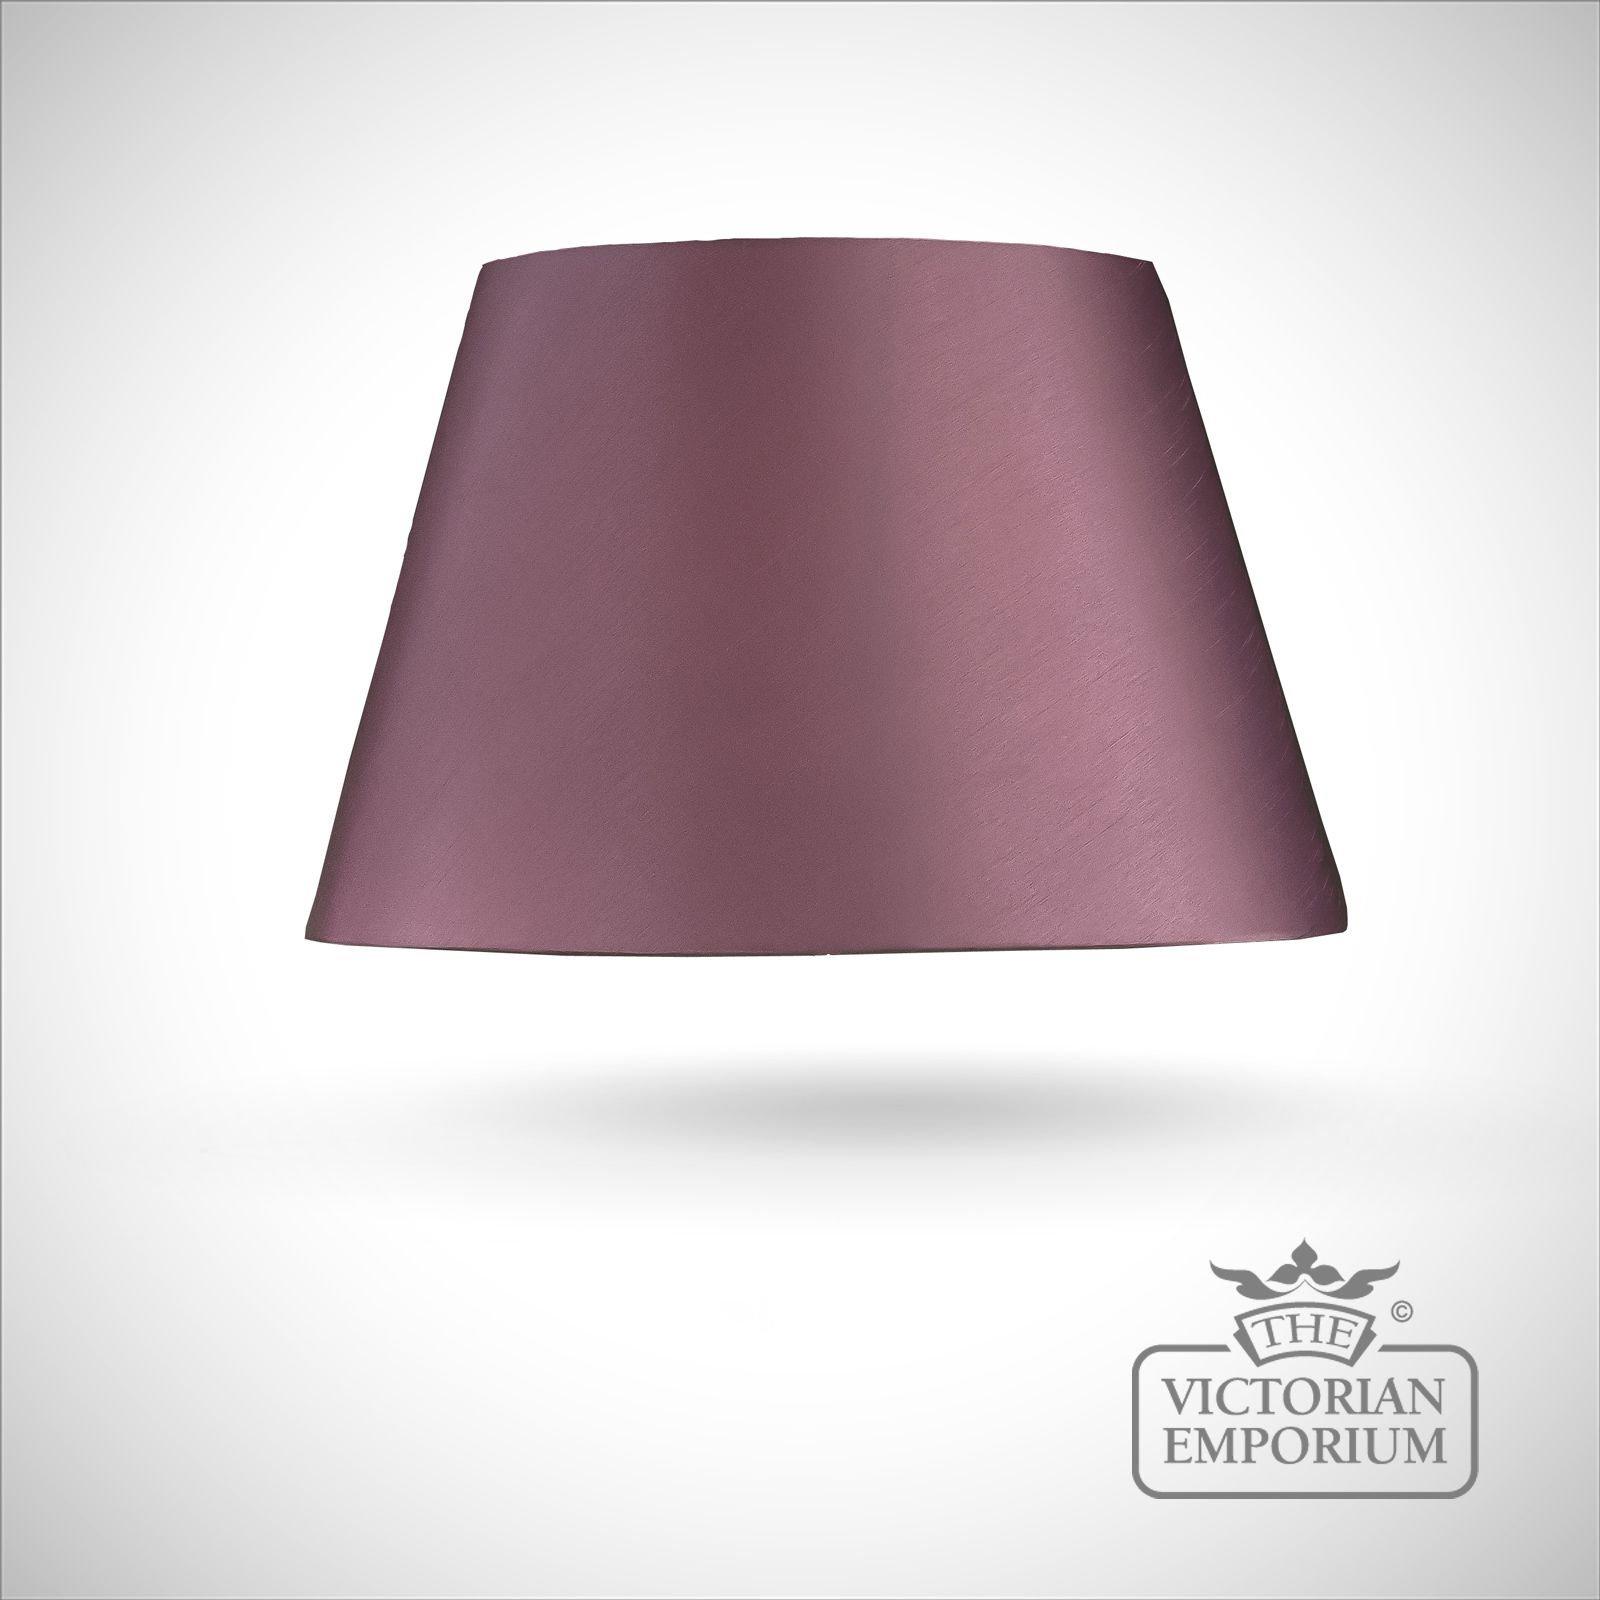 Empire Lamp Shade In Amethyst 51cm Lamp Shades